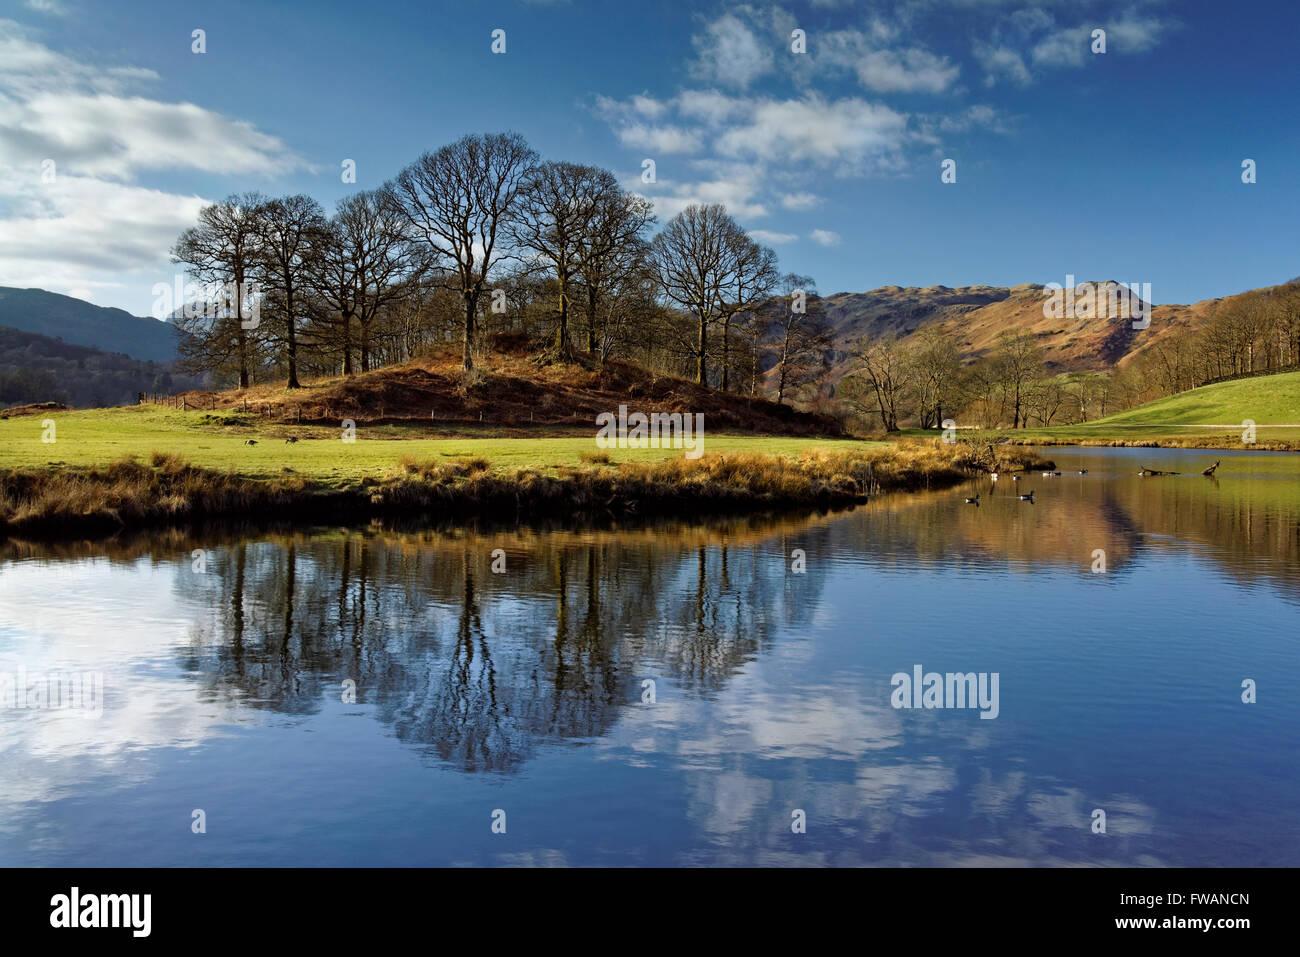 UK,Cumbria,Lake District,River Brathay near Elterwater Stock Photo